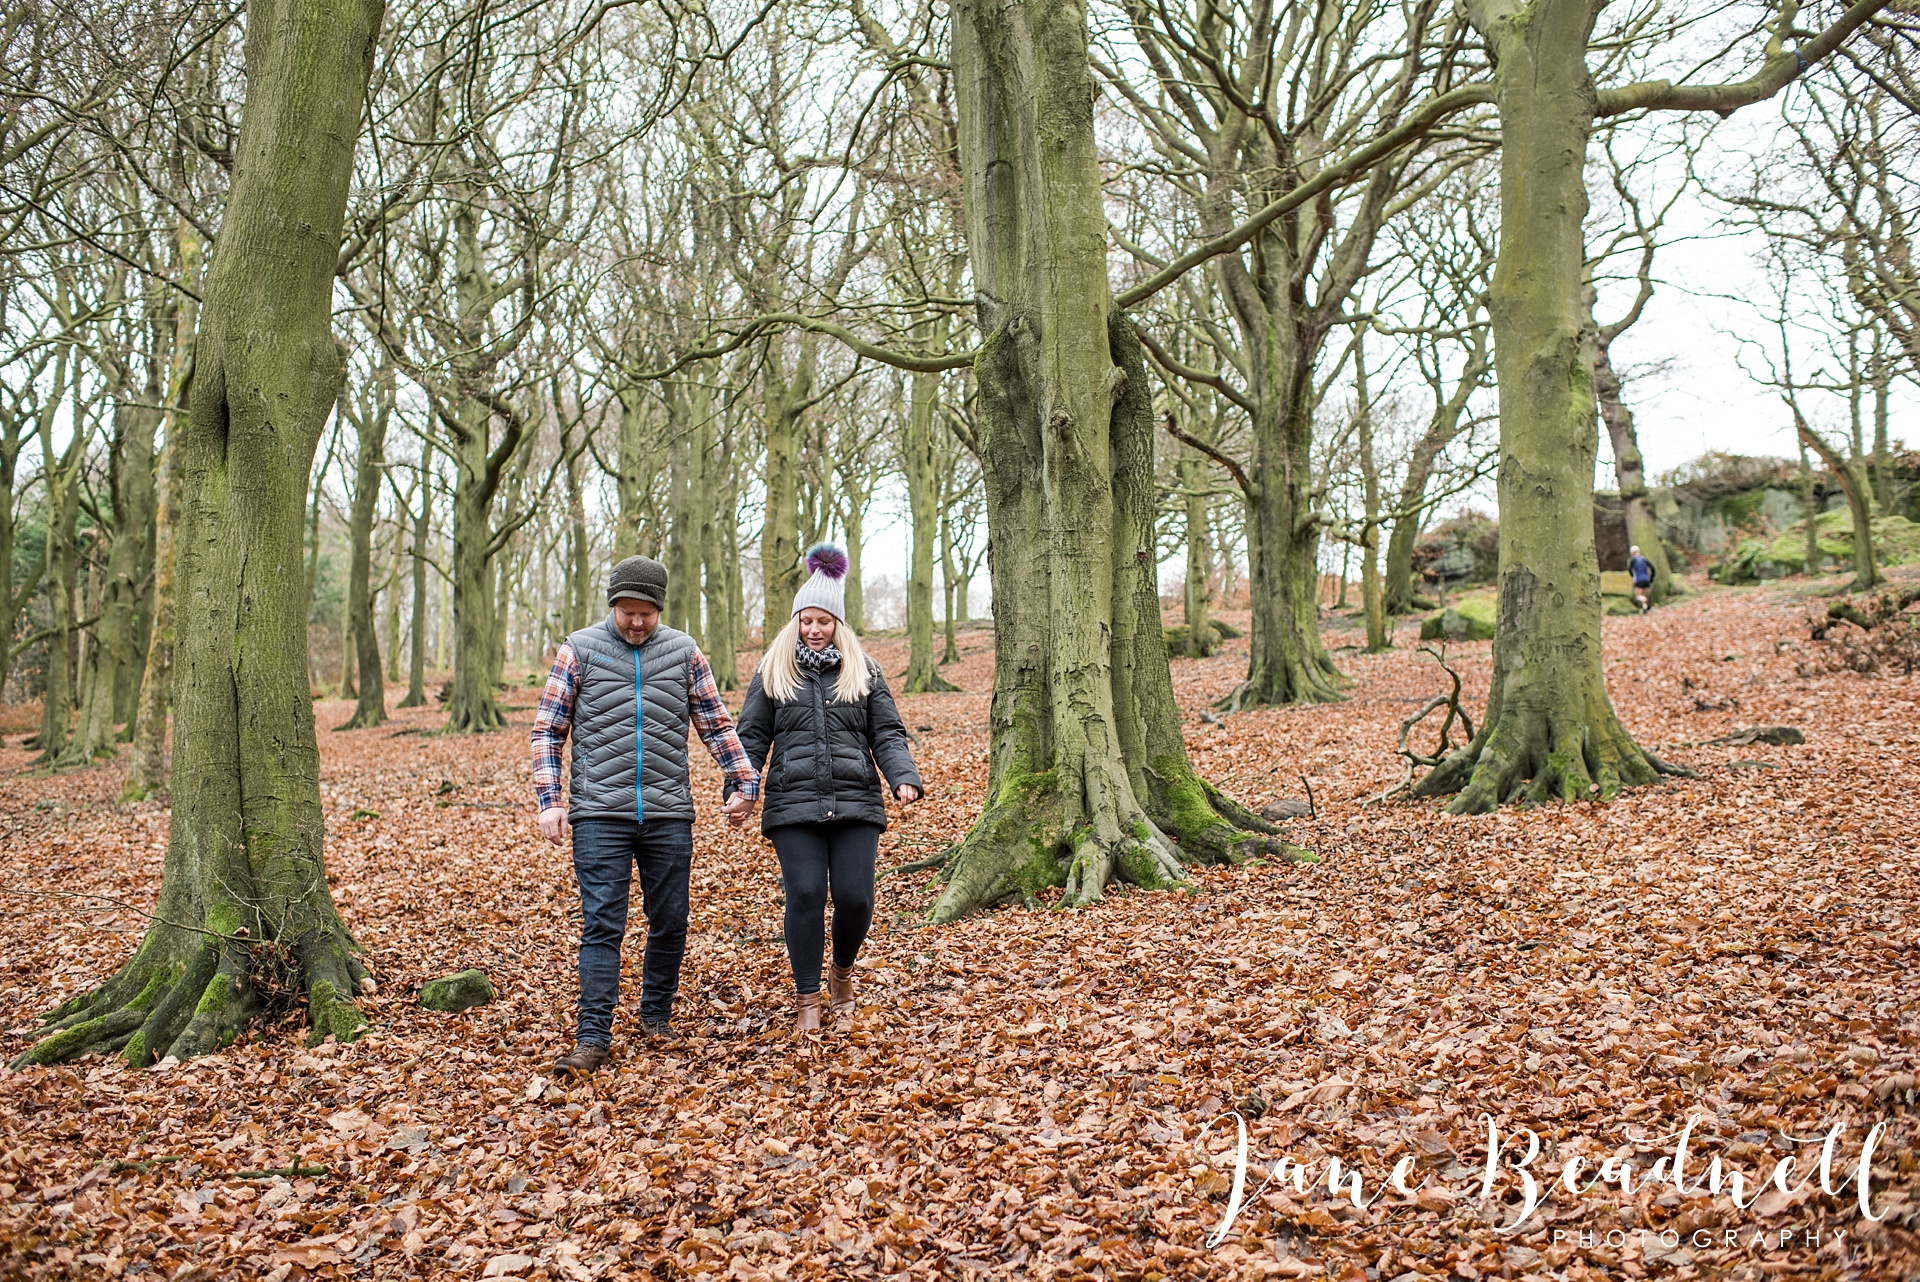 yorkshire-wedding-photographer-jane-beadnell-photography-uk-and-destination-wedding-photographer-engagement-shoot_0043